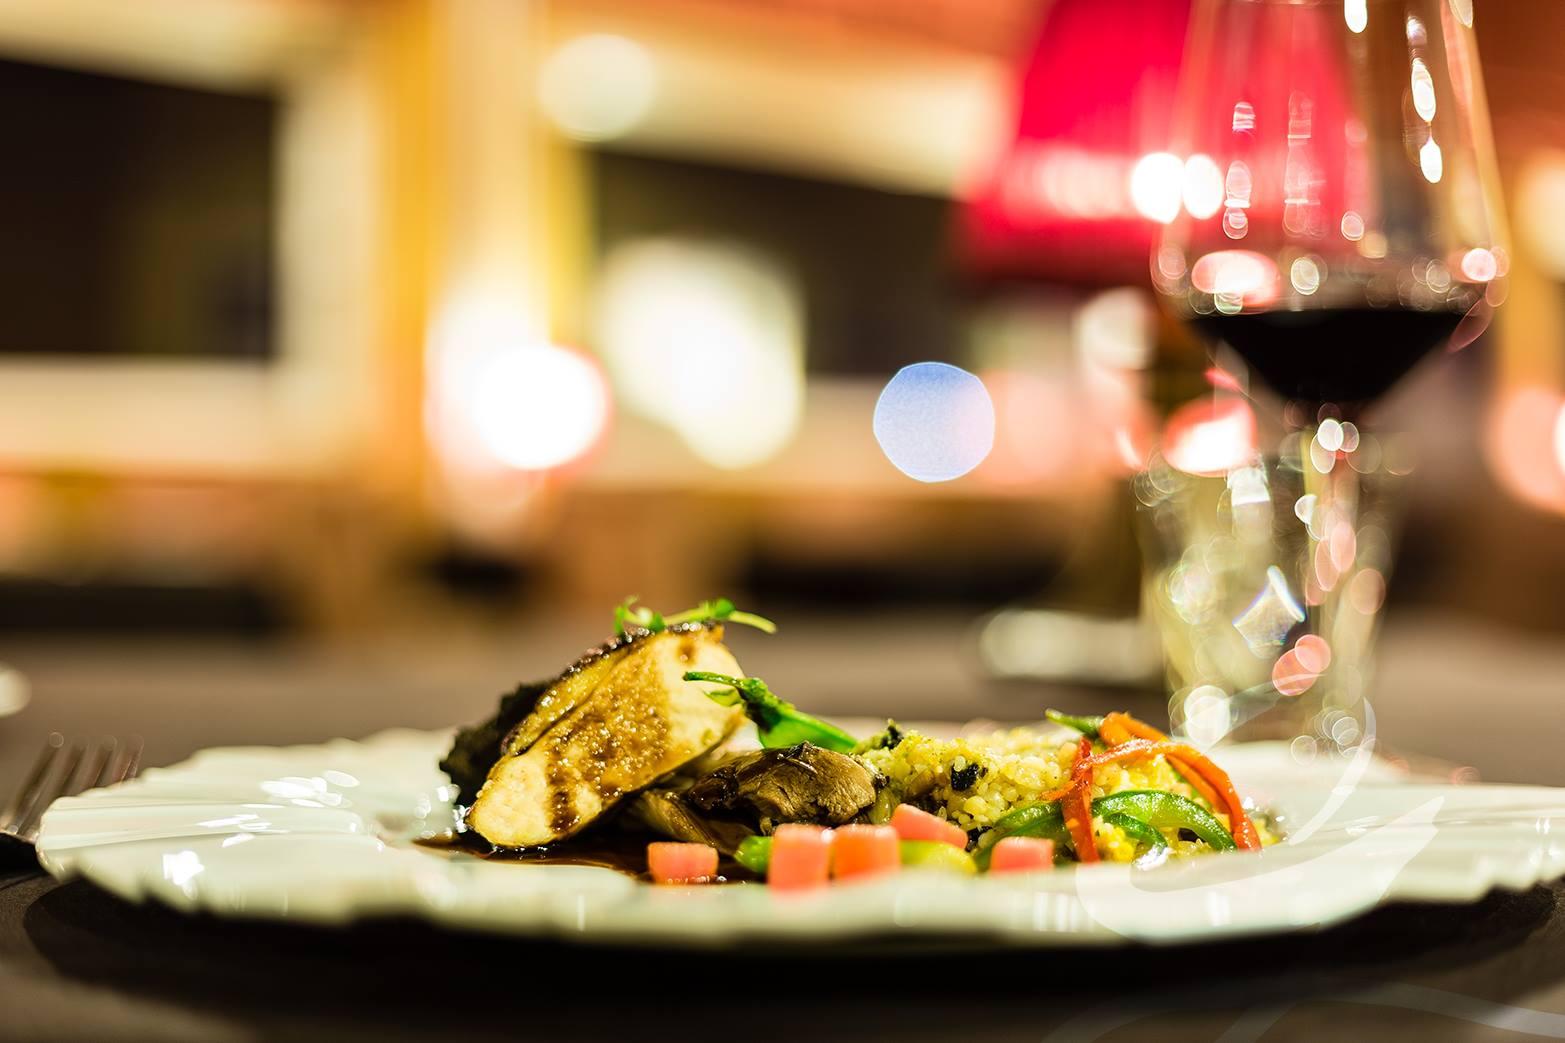 Portuguese Gastronomy: Best Luxury Restaurants in Portugal luxury restaurants Portuguese Gastronomy: Best Luxury Restaurants in Portugal 96266